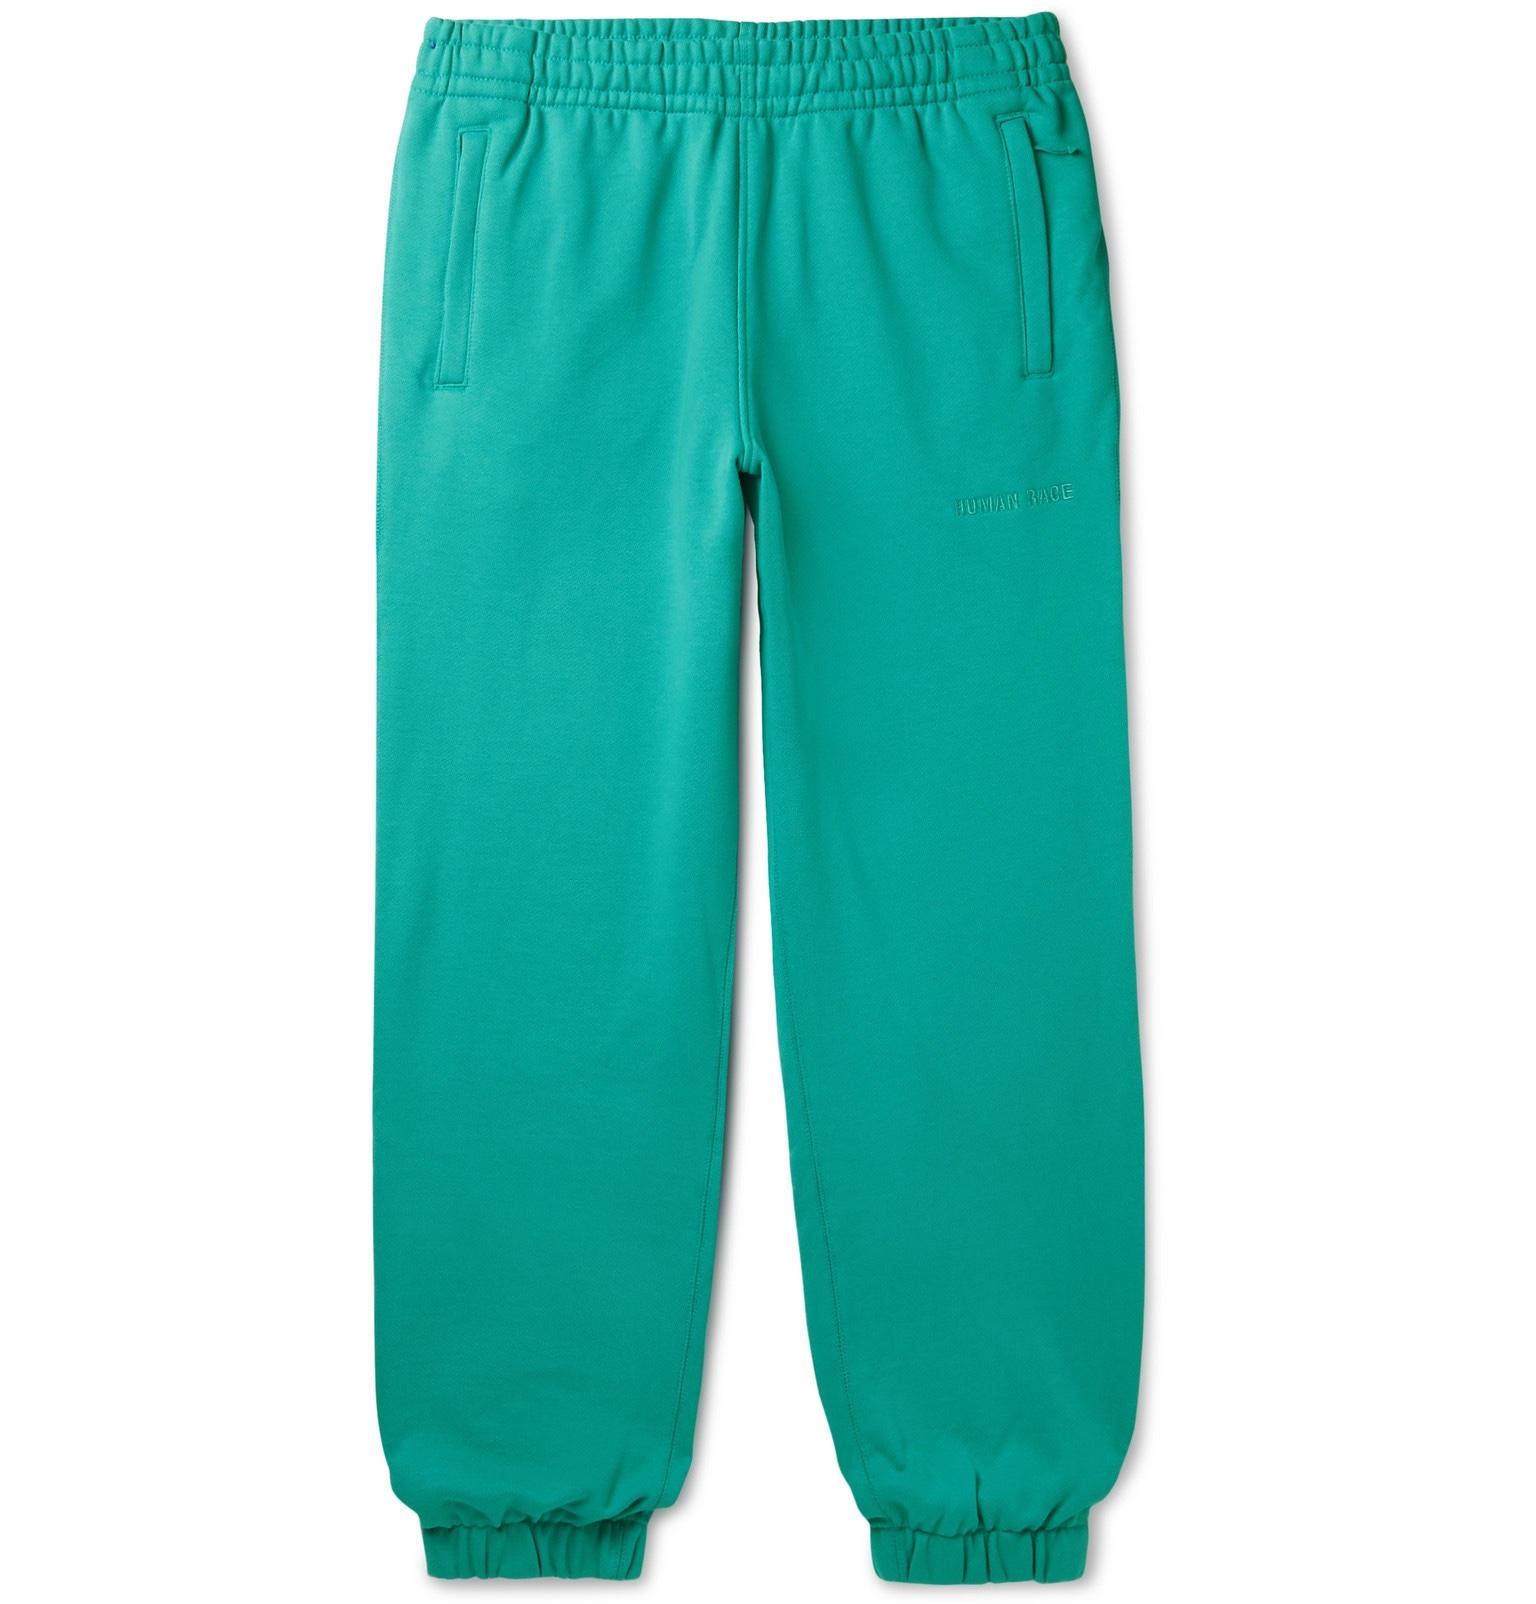 adidas x Pharrell Williams pants